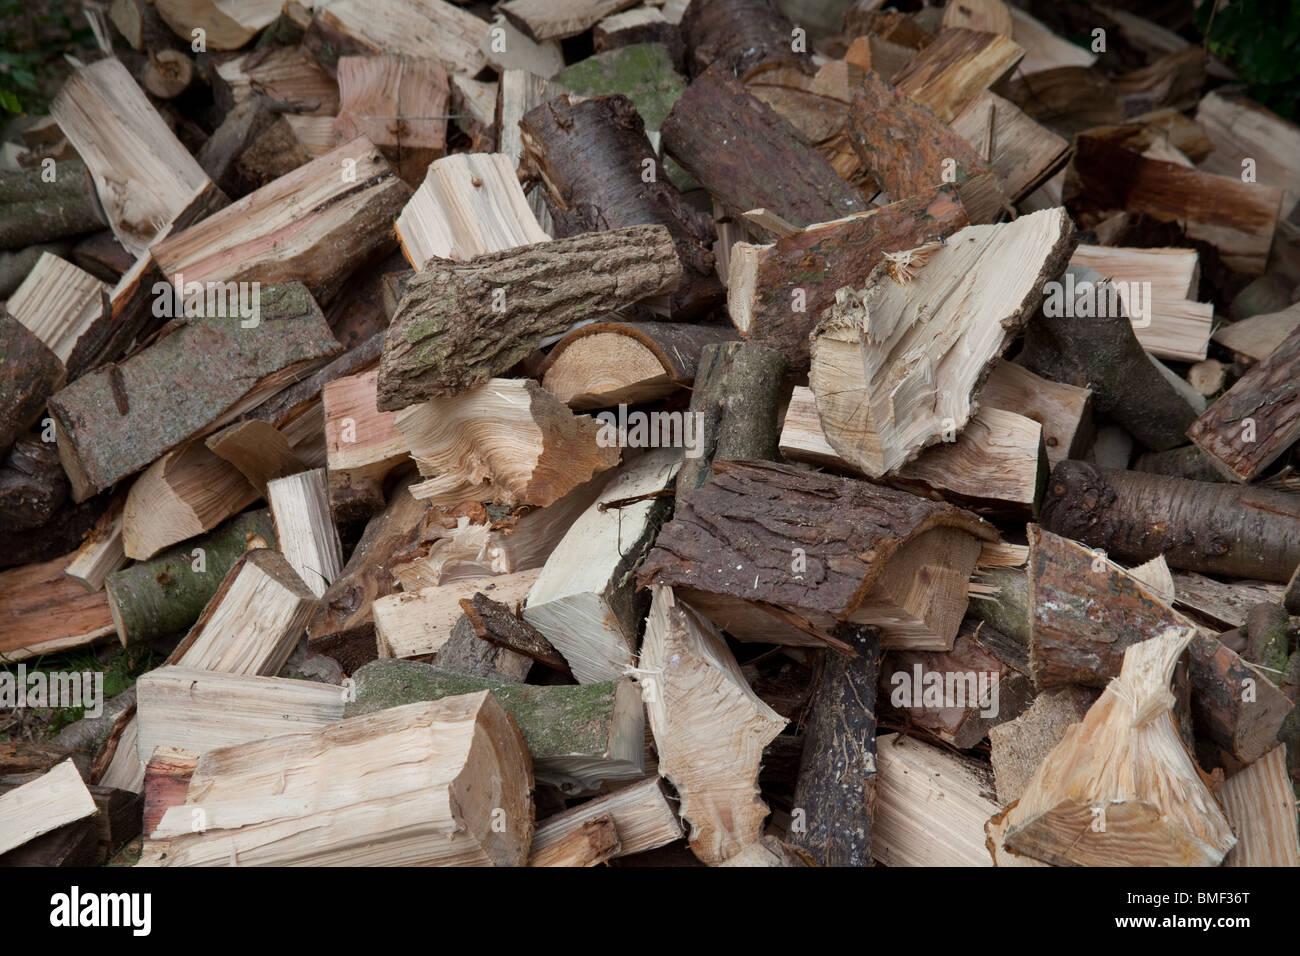 Log Pile In The Garden Hampshire England Stock Photo